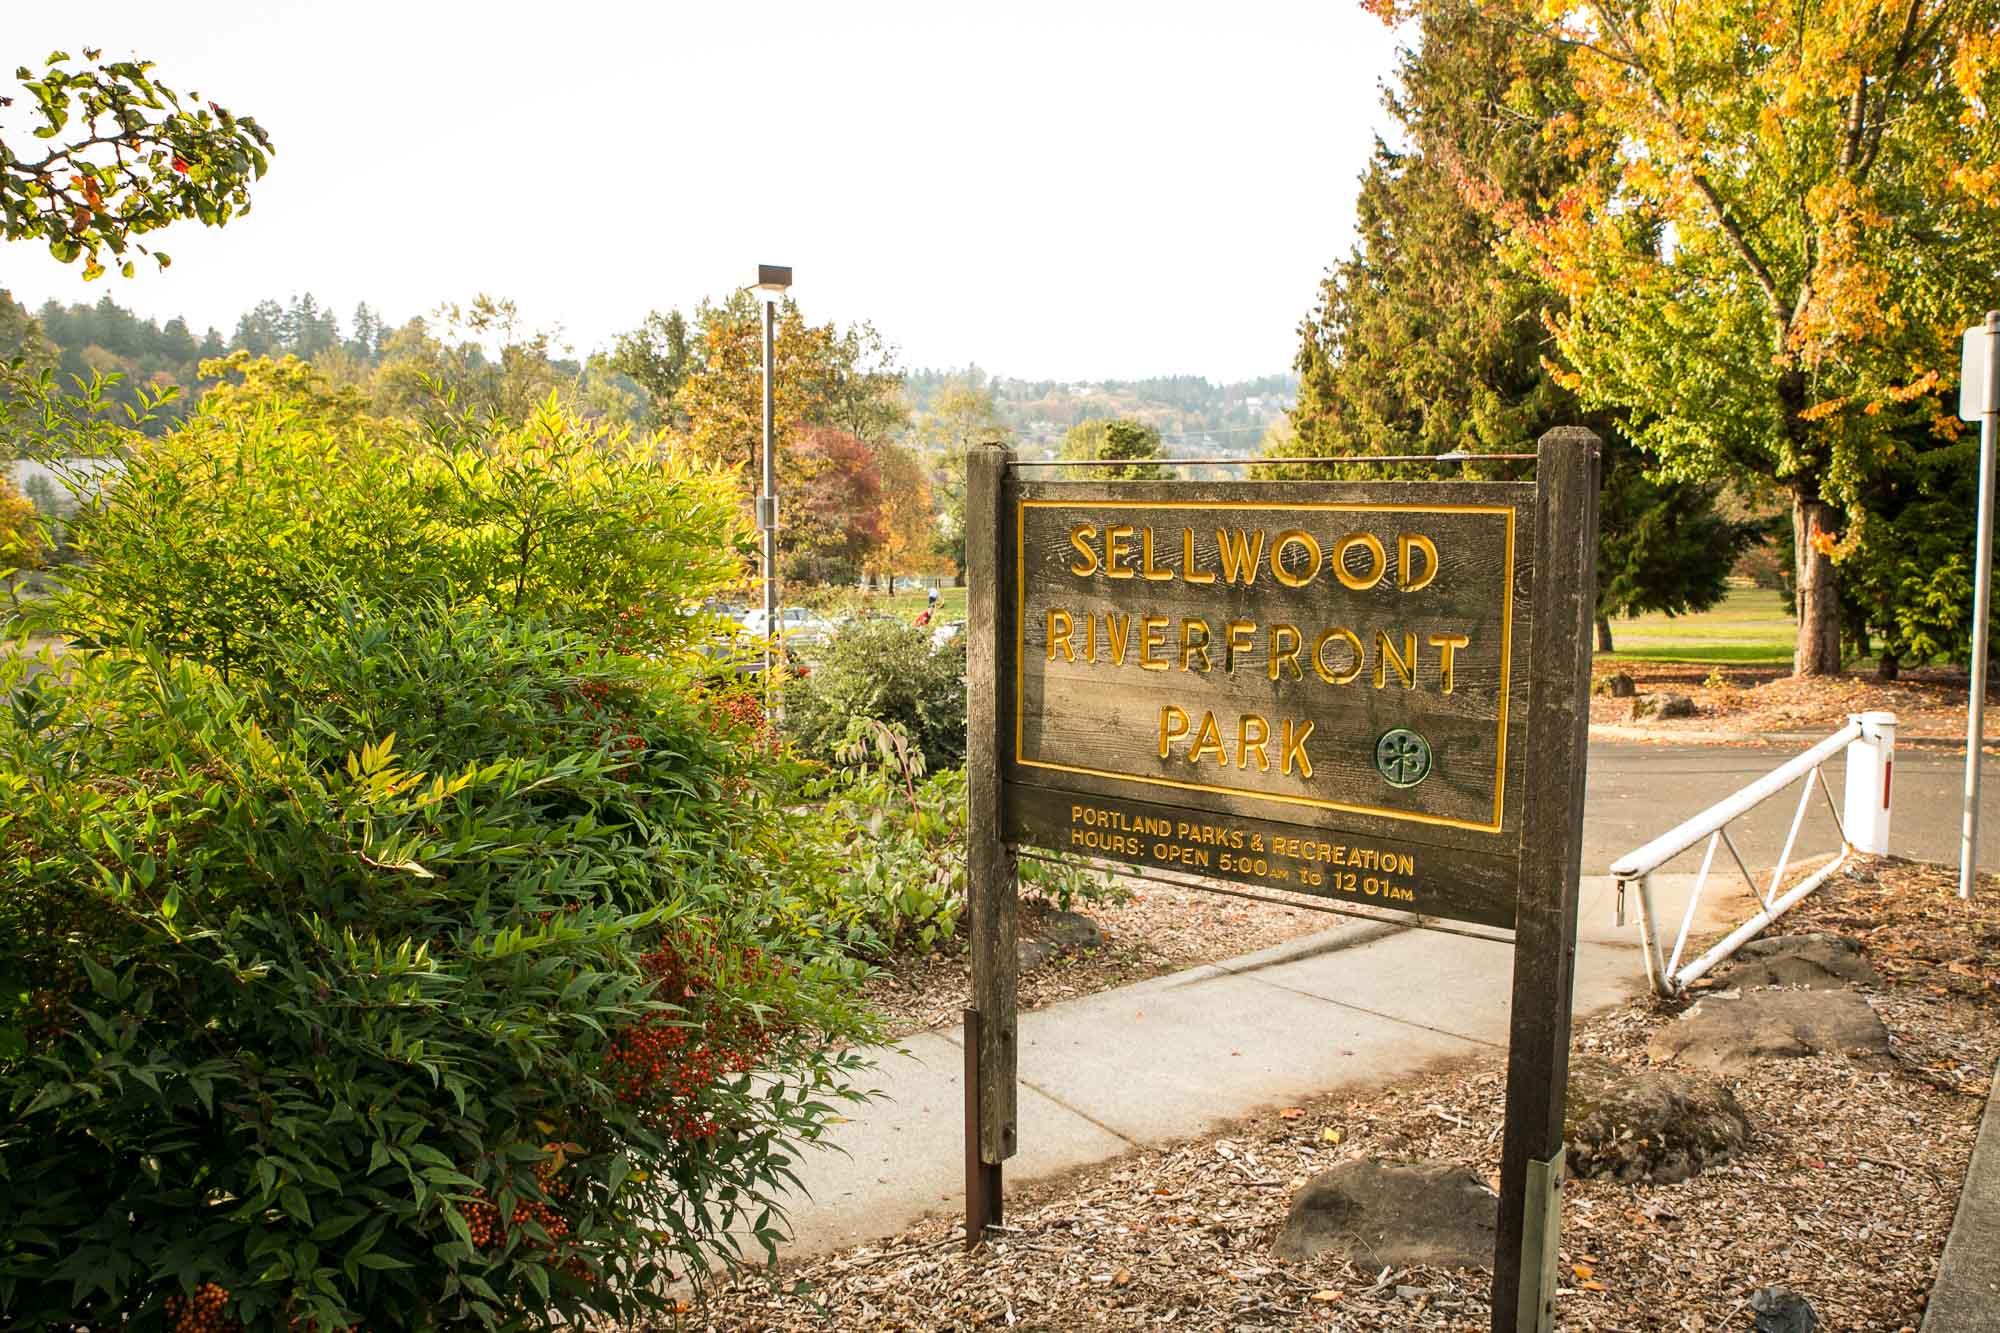 visit-sellwood-moreland-business-alliance_sellwood-riverfront-park.jpg